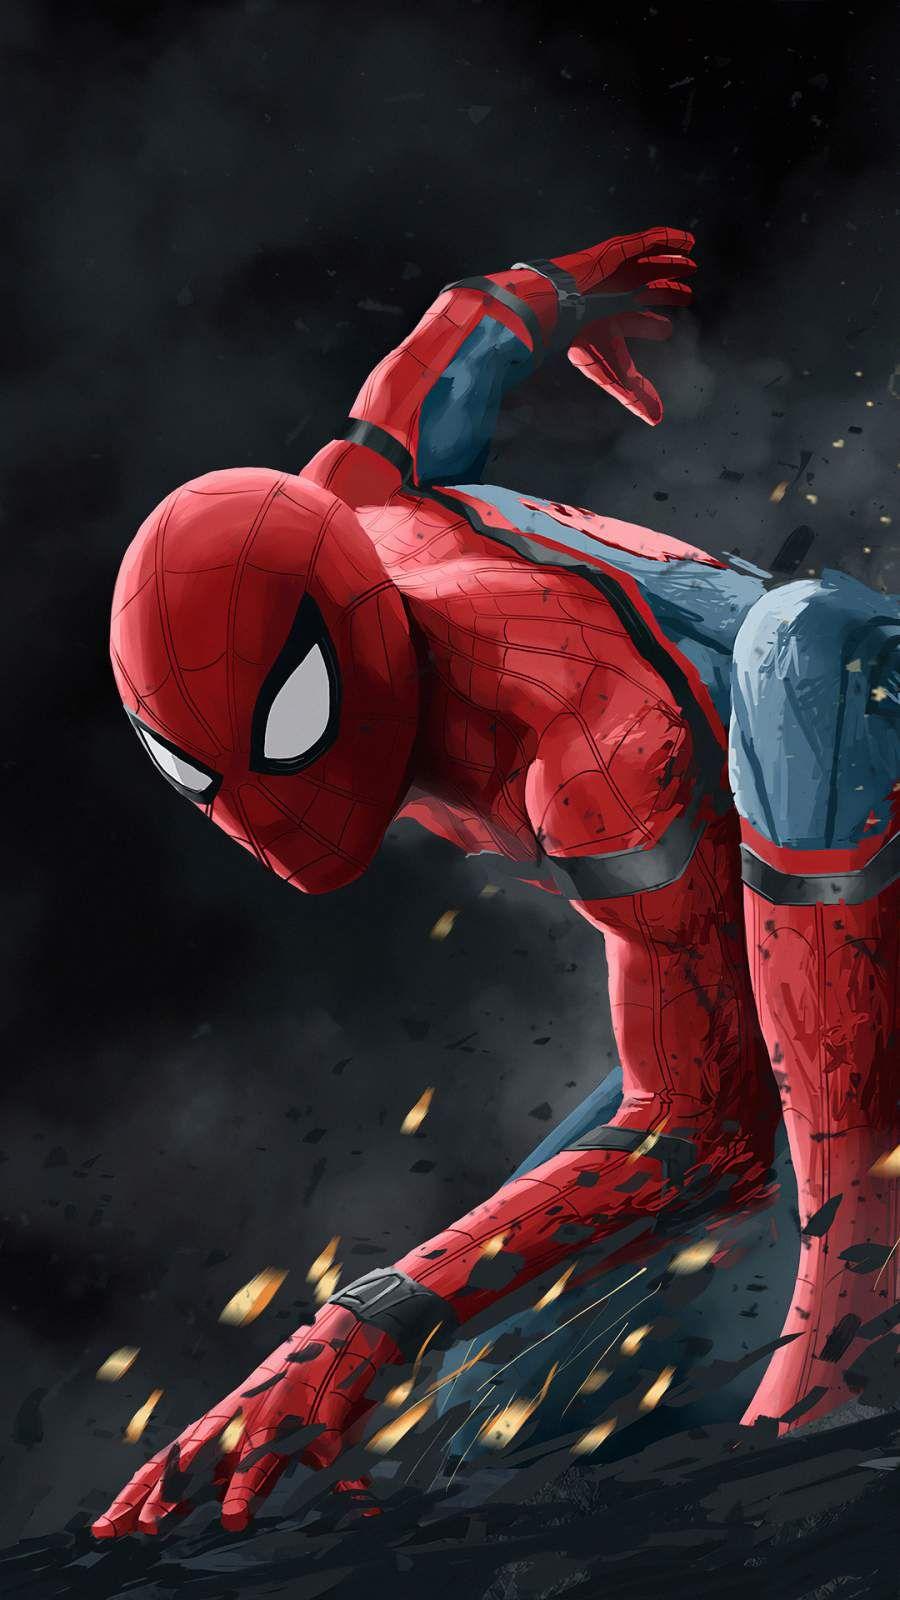 Spider Man Action Art Iphone Wallpaper Marvel Spiderman Art Spiderman Wallpaper Spiderman